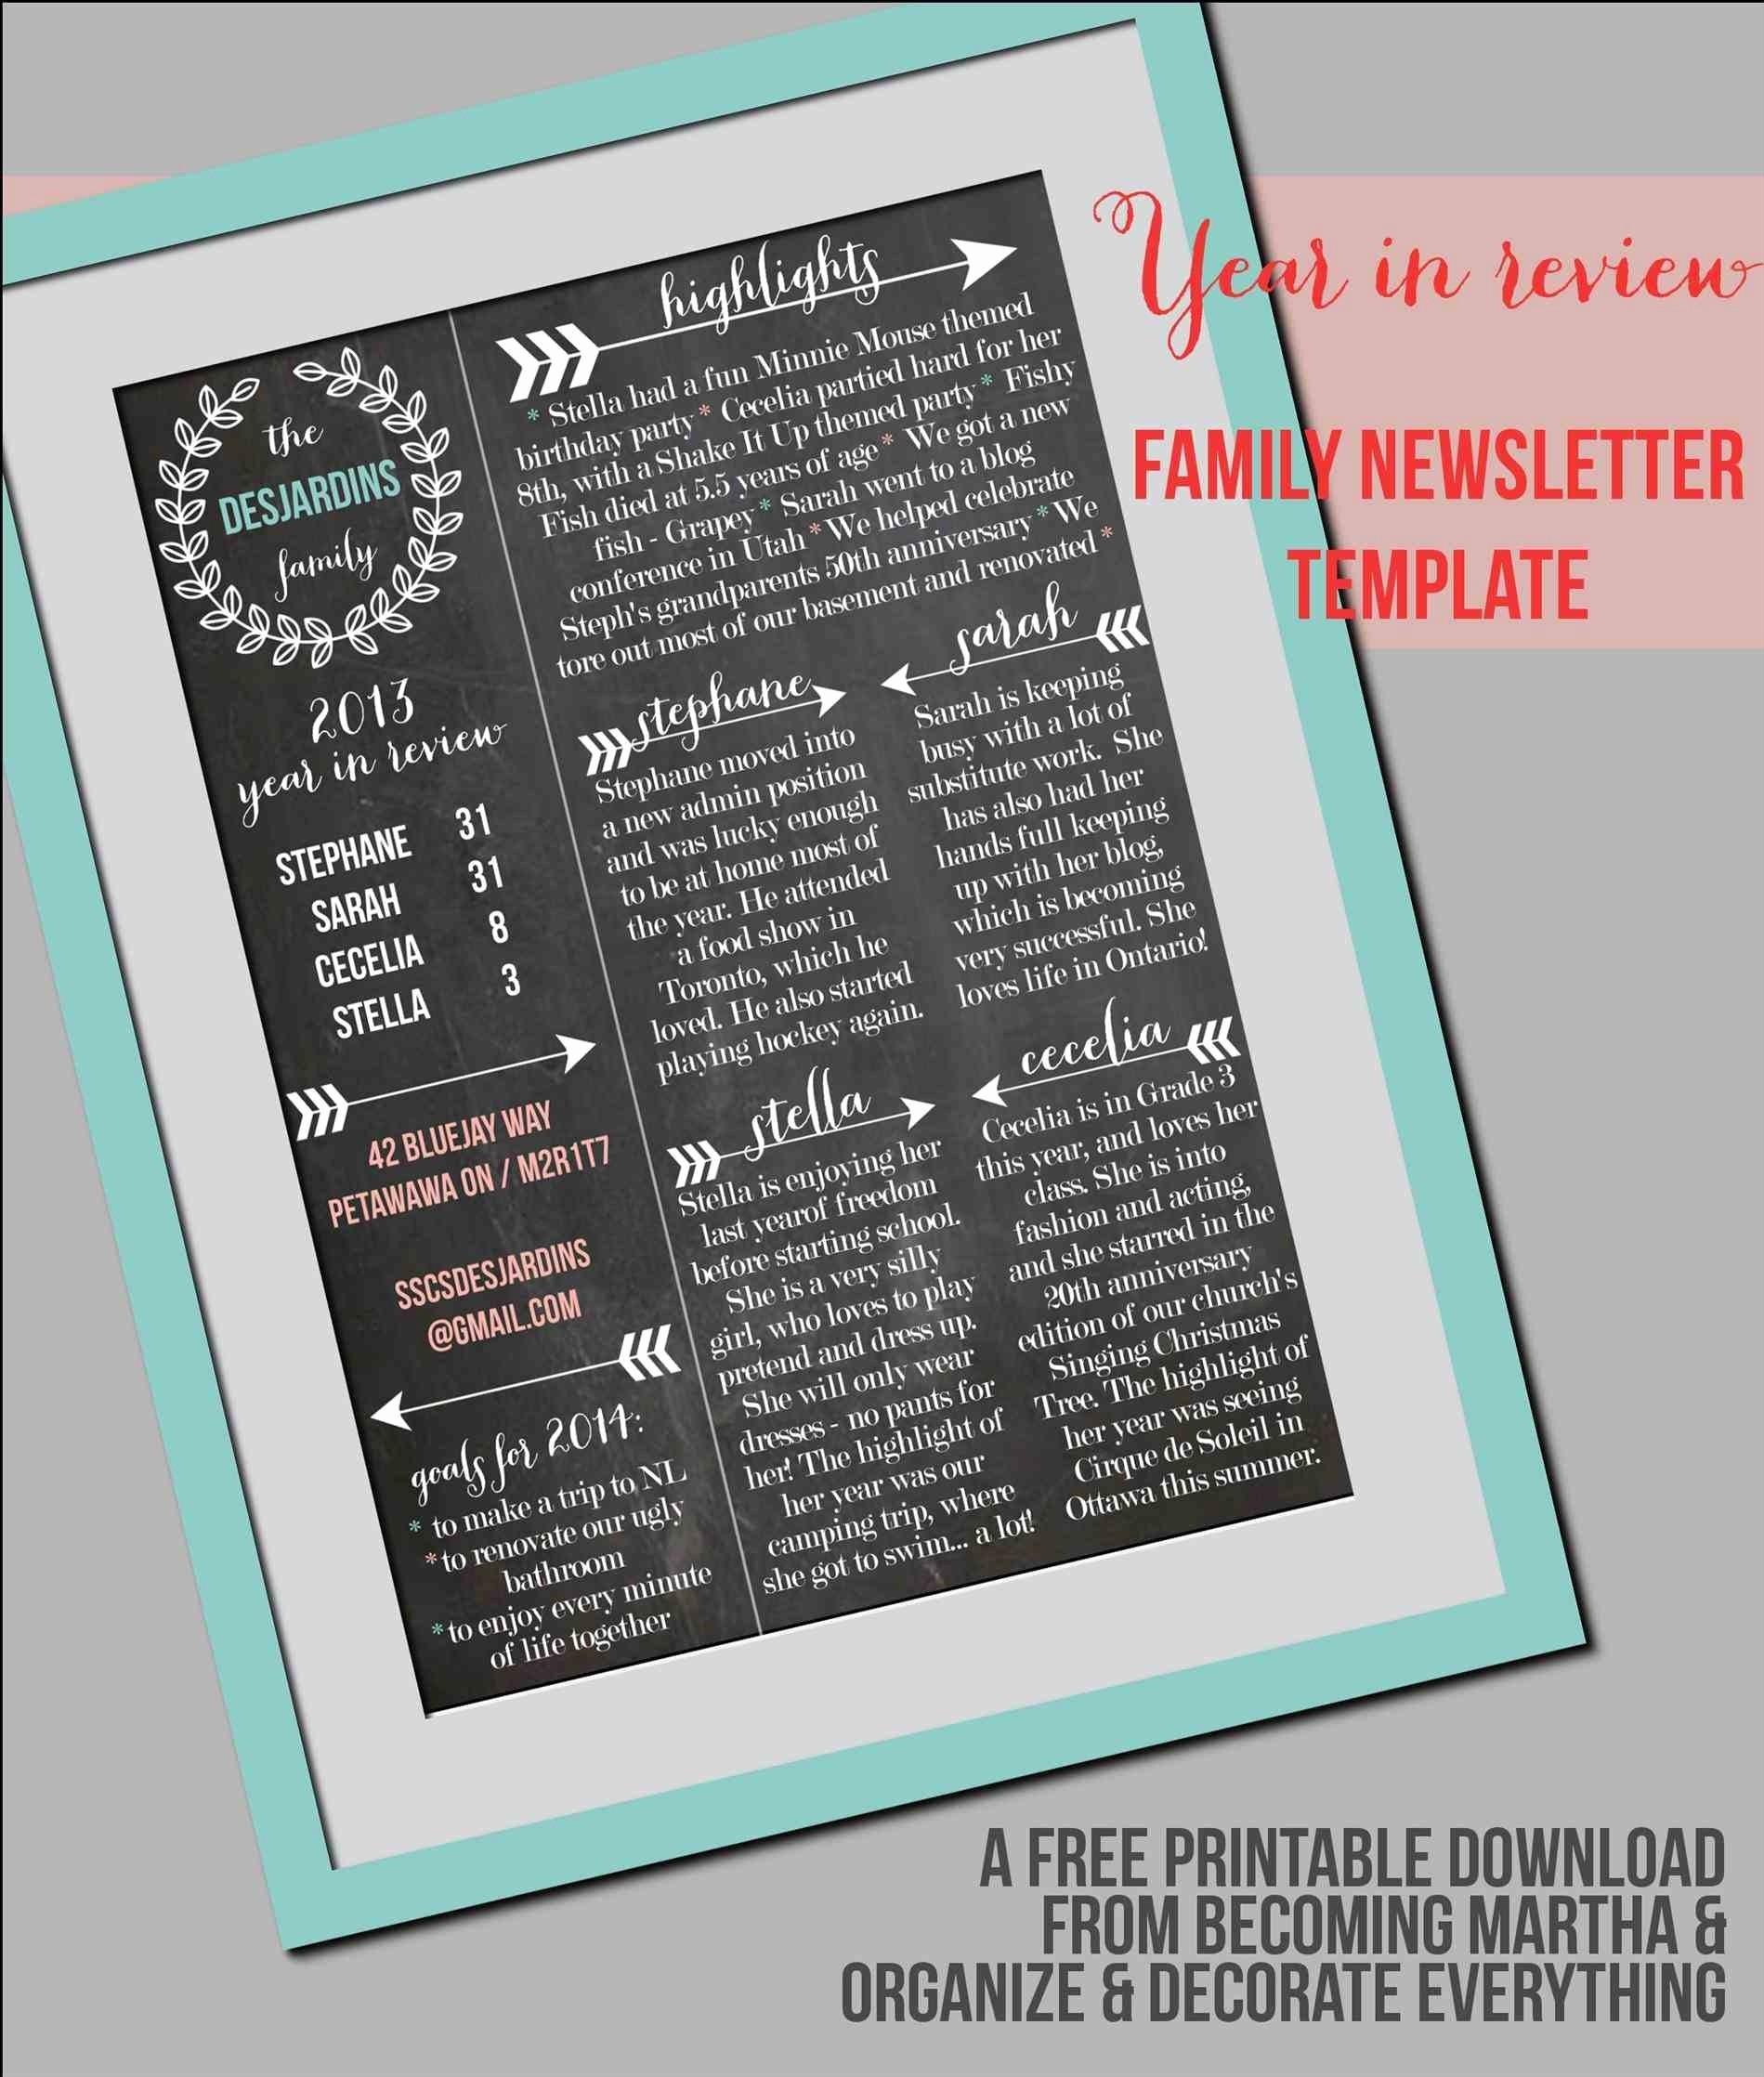 Christmas Family Newsletter Templates Free Elegant Beautiful Free Printable Funeral Program Template